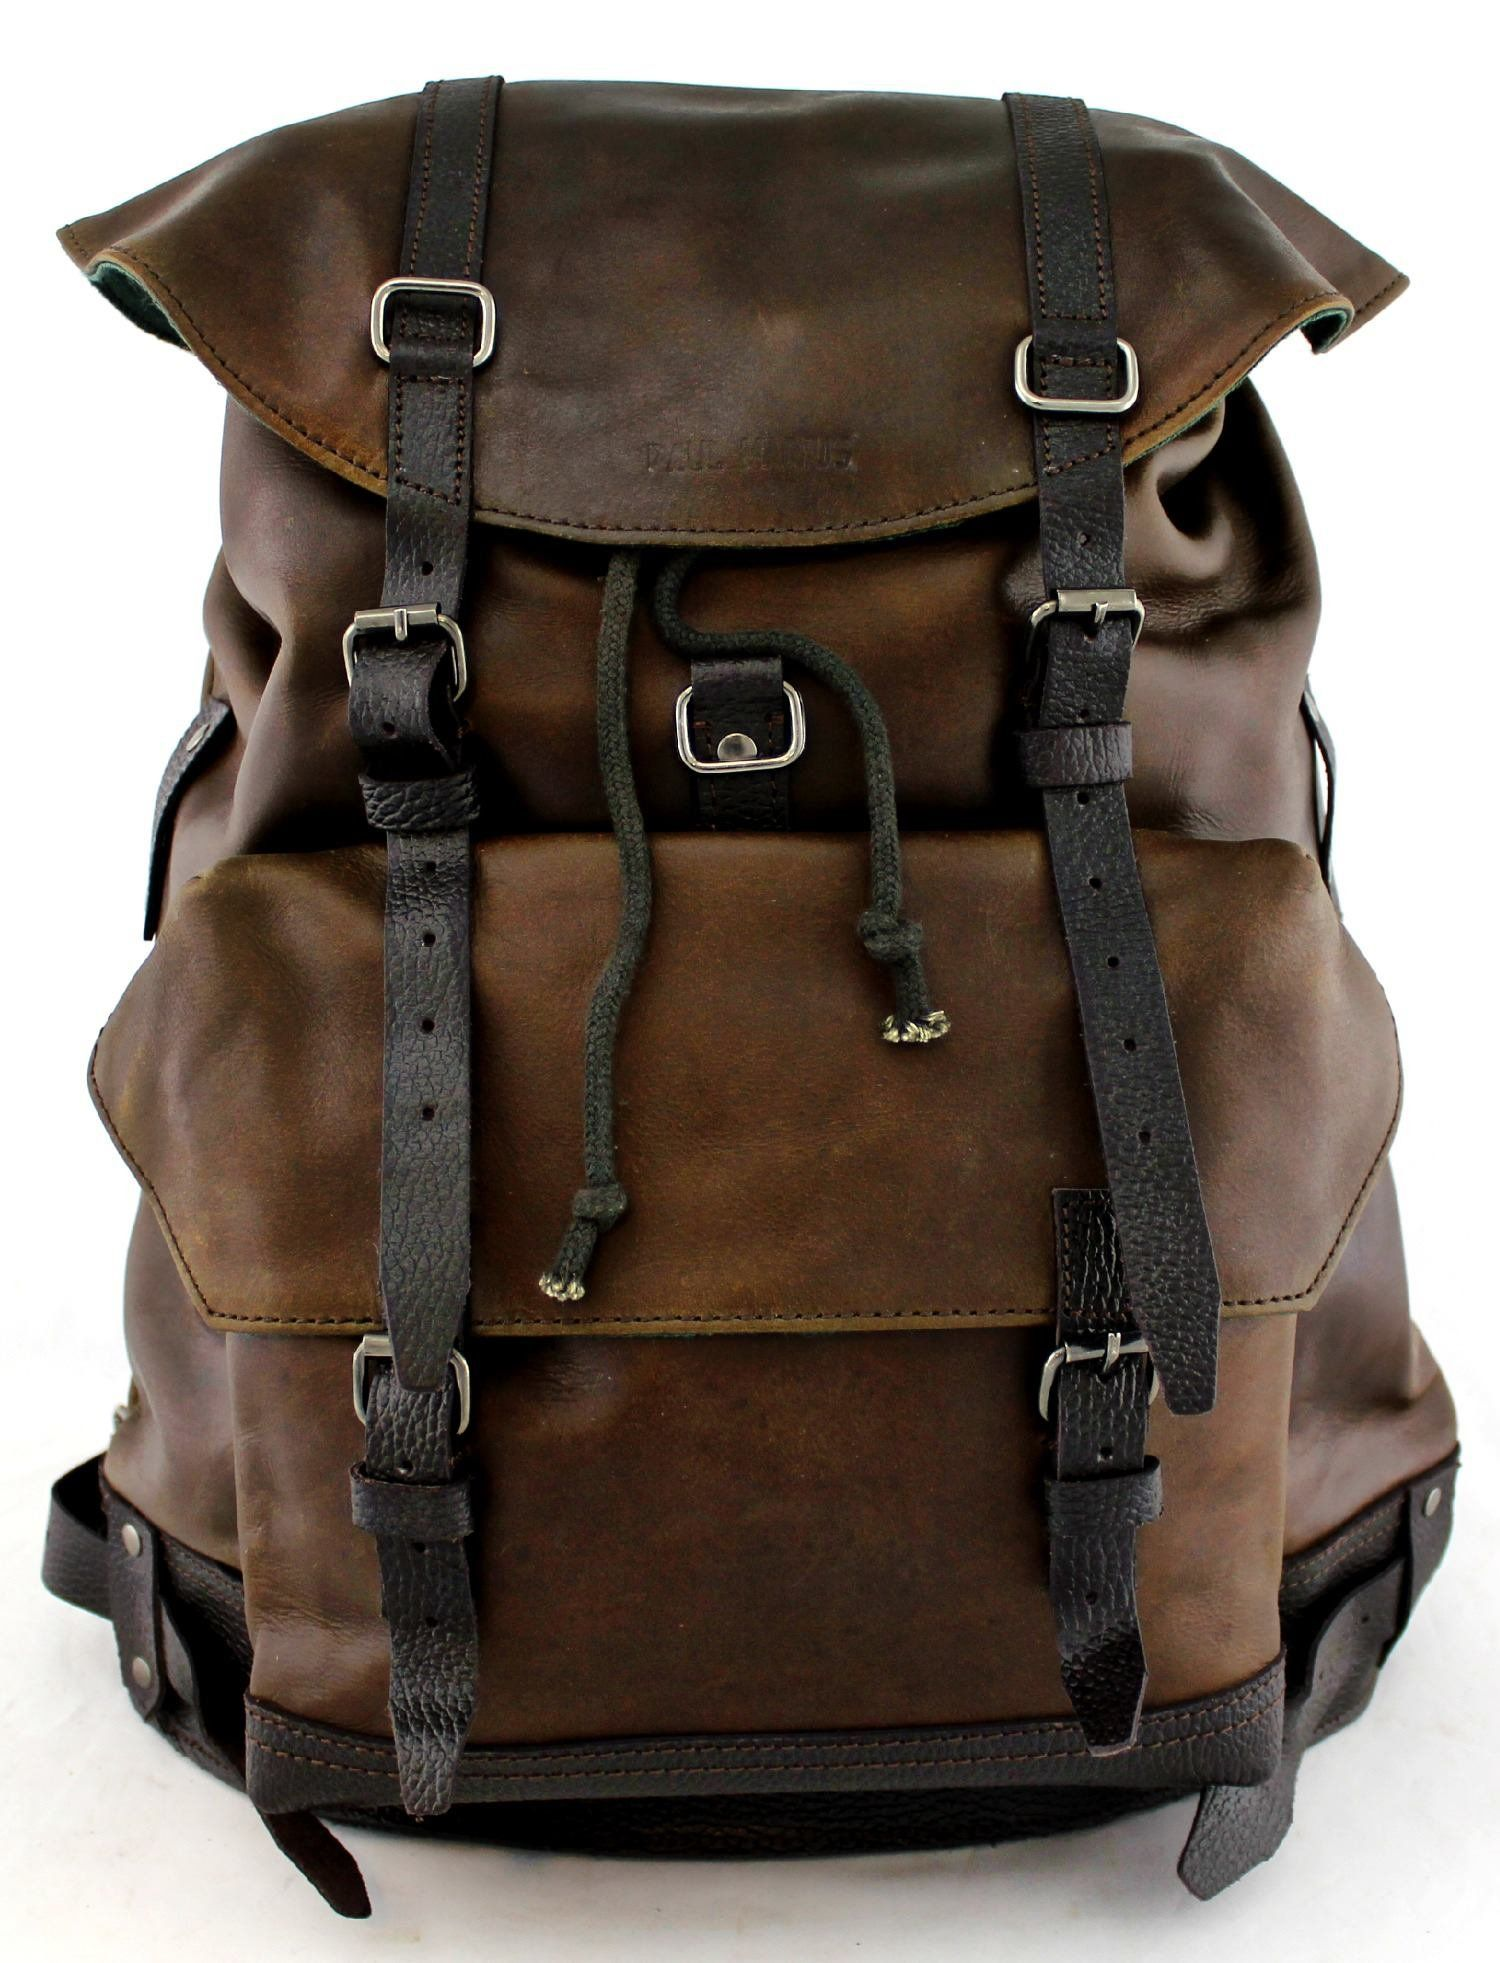 PAUL MARIUS Rucksack knapsack Reisetasche Vintage-leder Alter Schwarz MON  LEGIONNAIRE 557855f65a98b